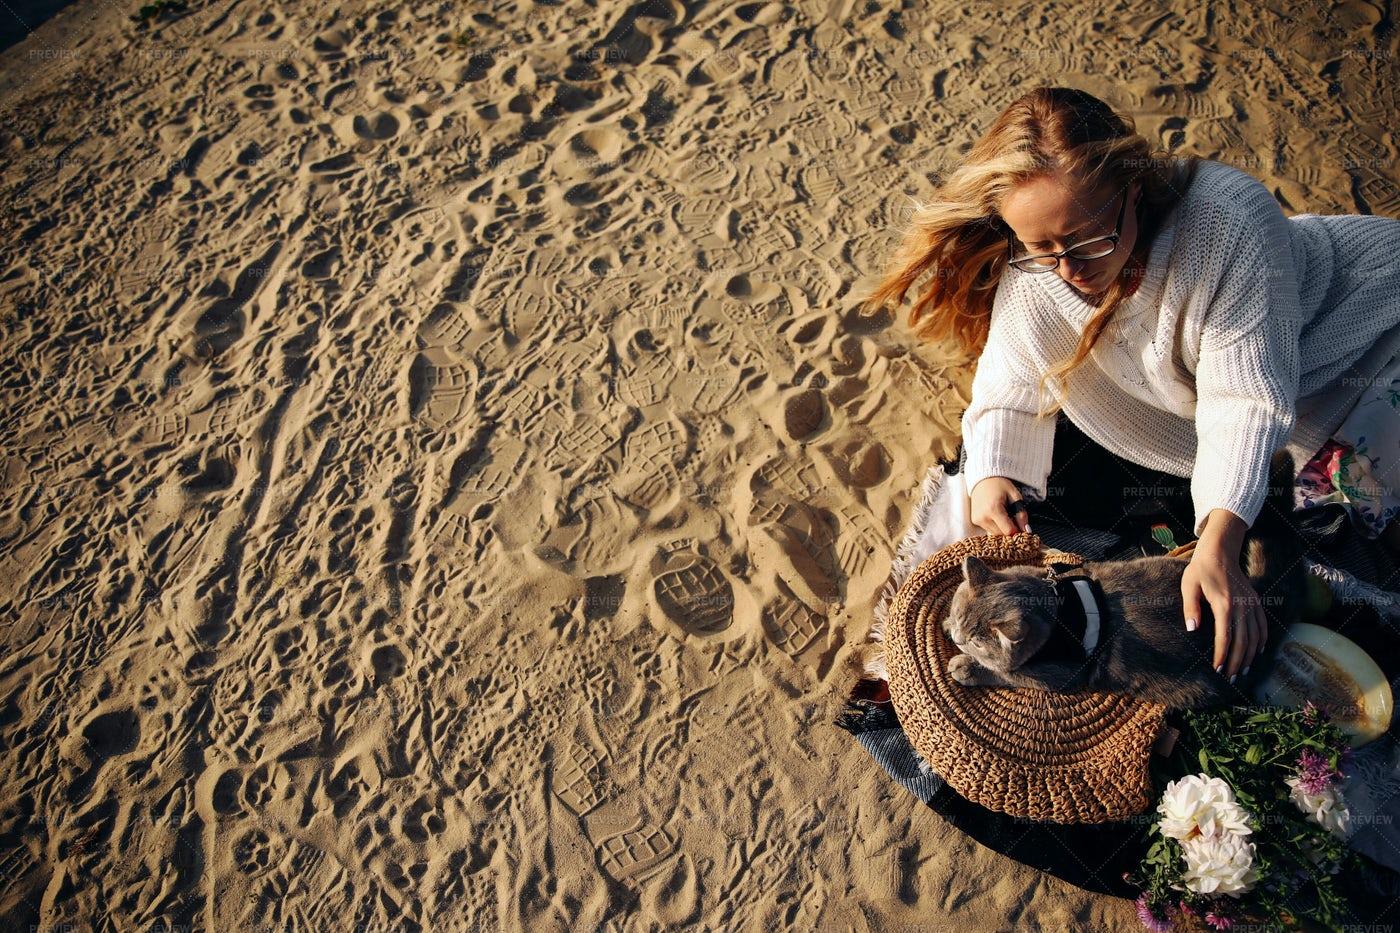 Woman With Cat At Beach: Stock Photos